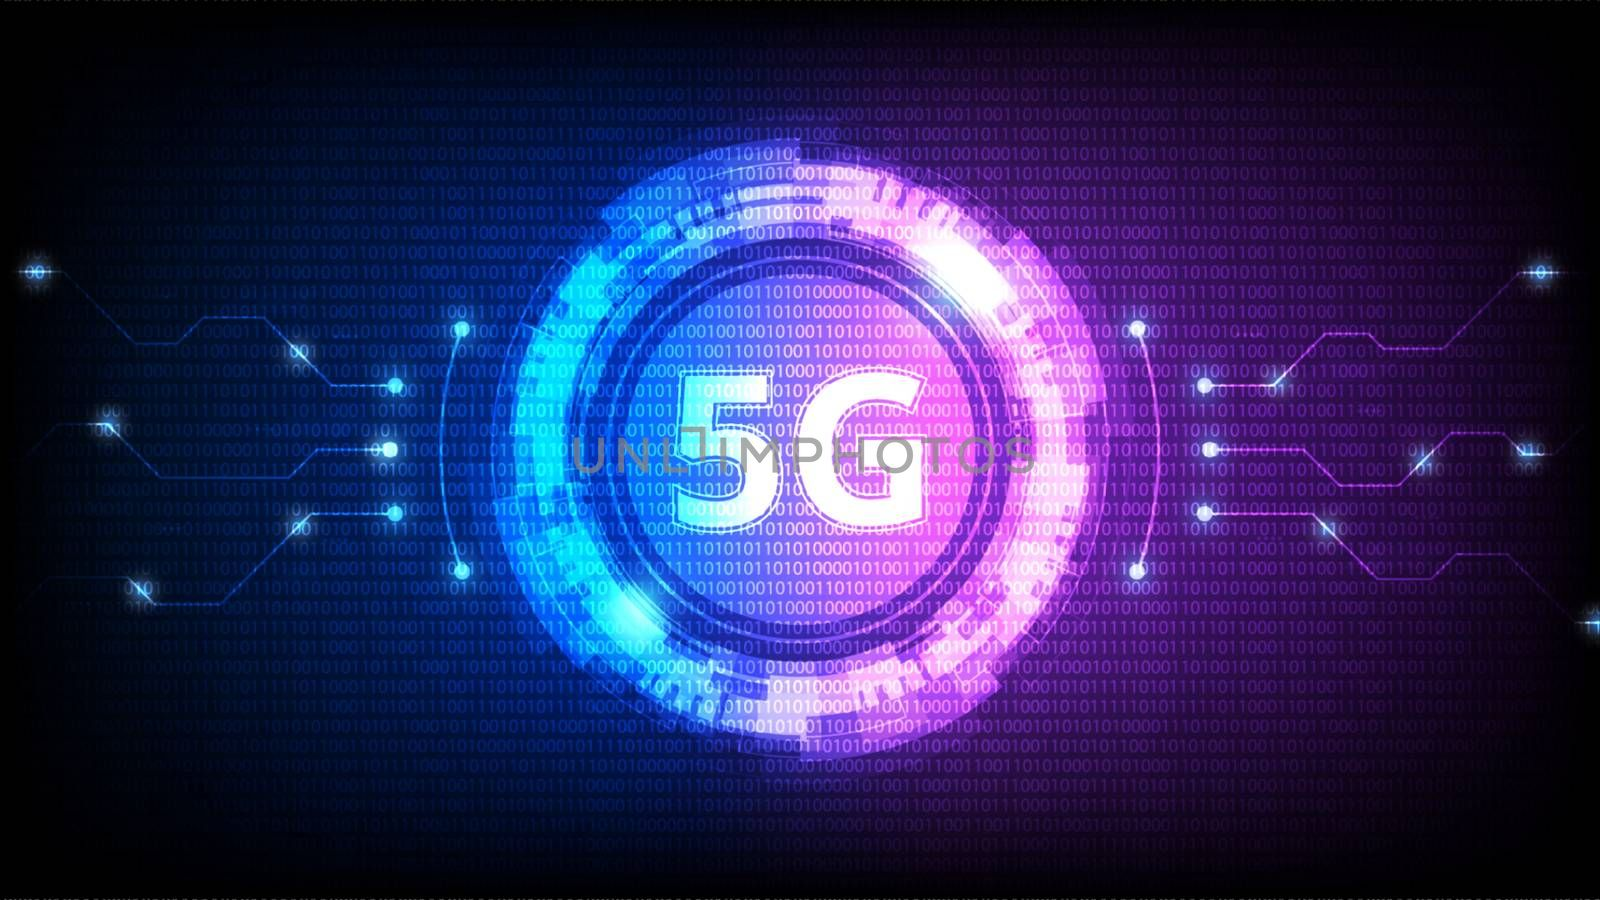 5G network, wireless technology